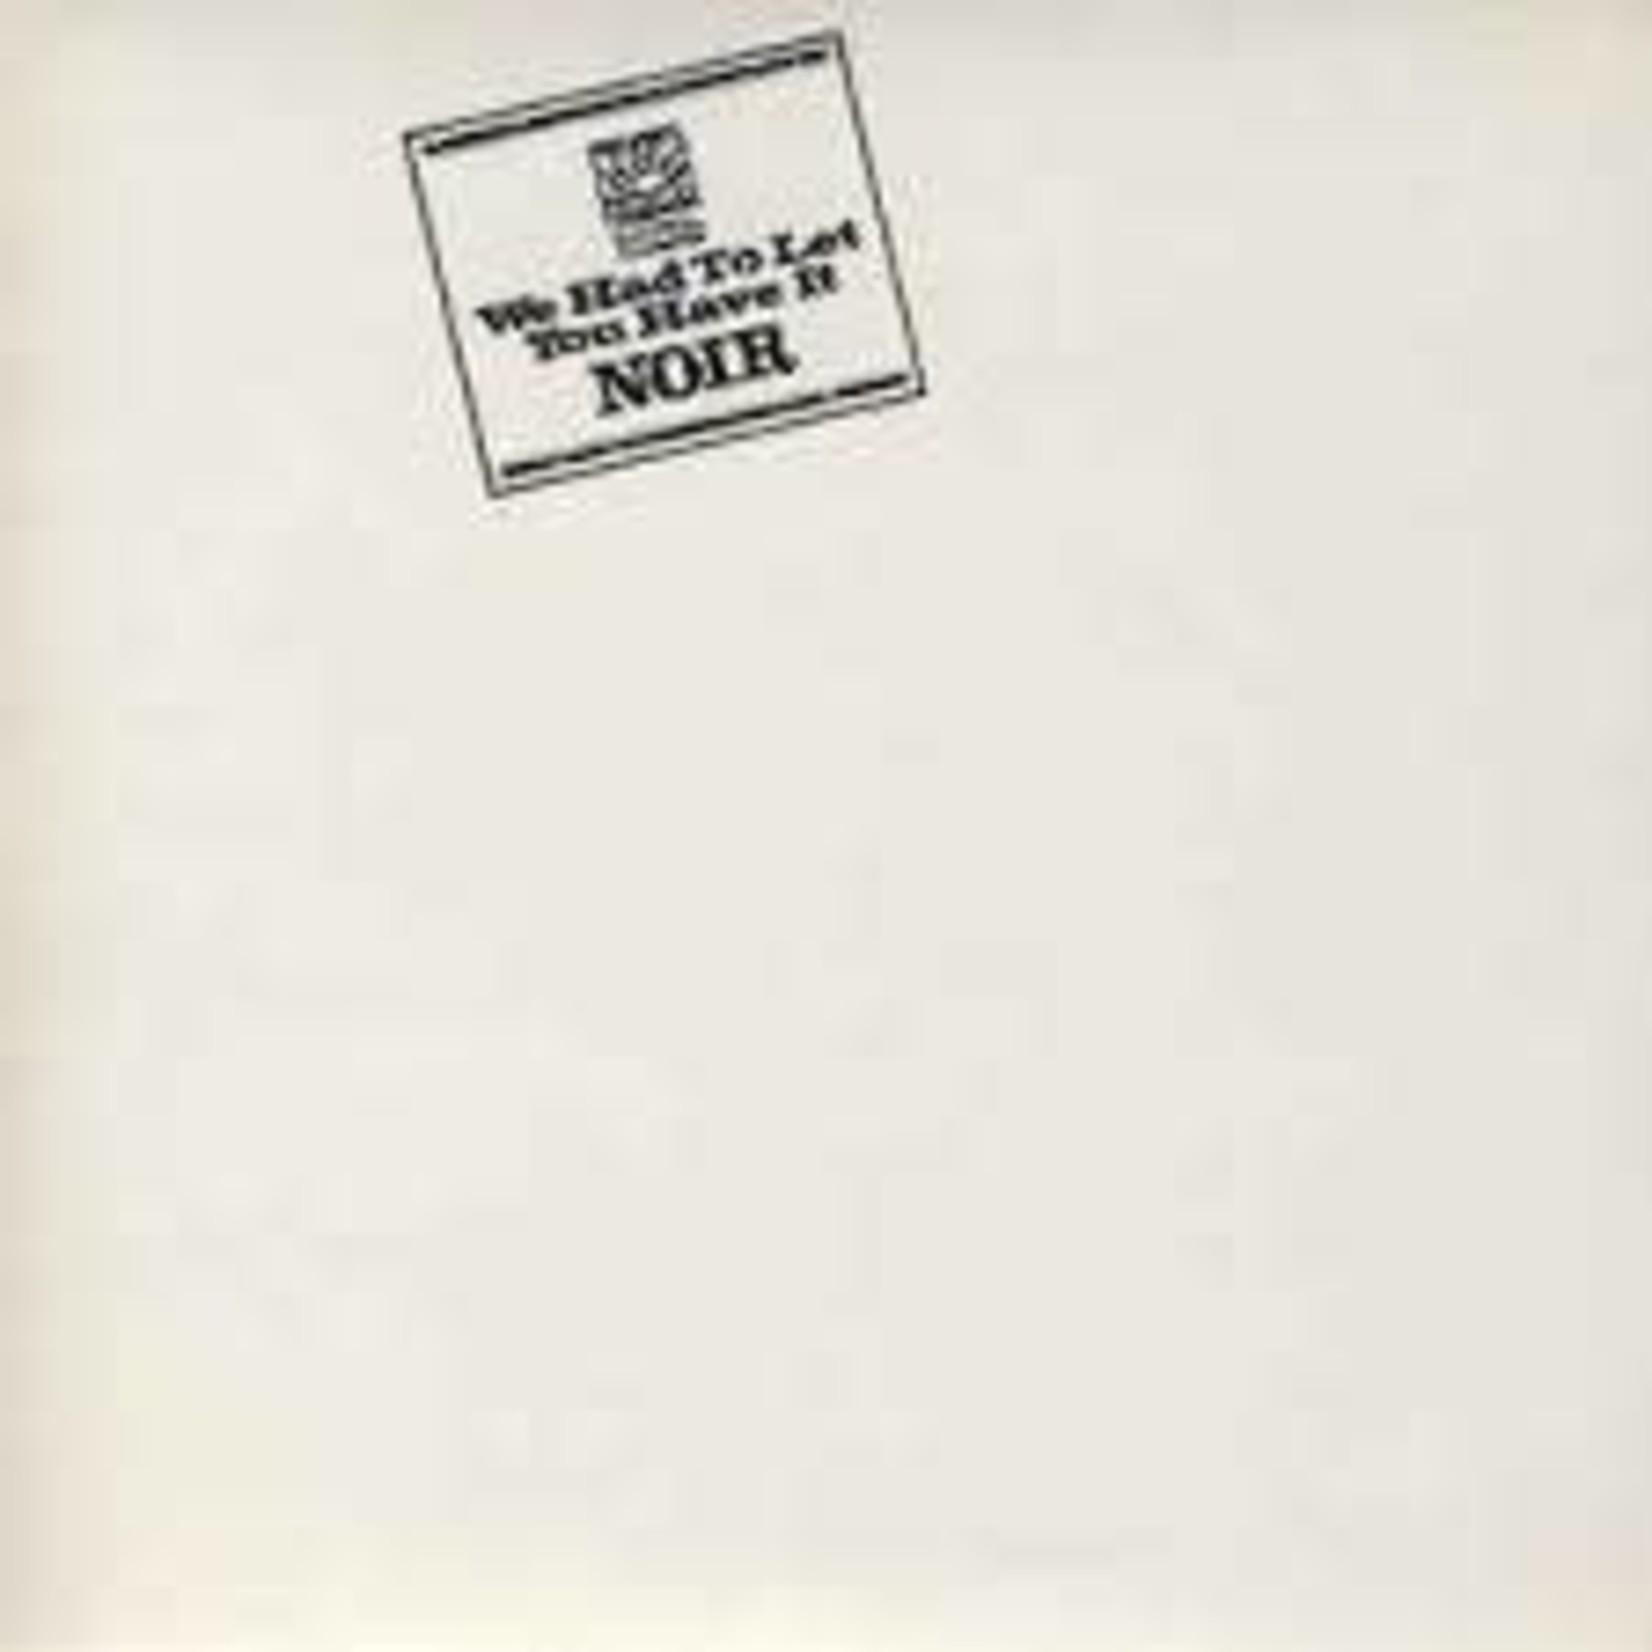 Vinyl Noir - We Had To Let You Have It